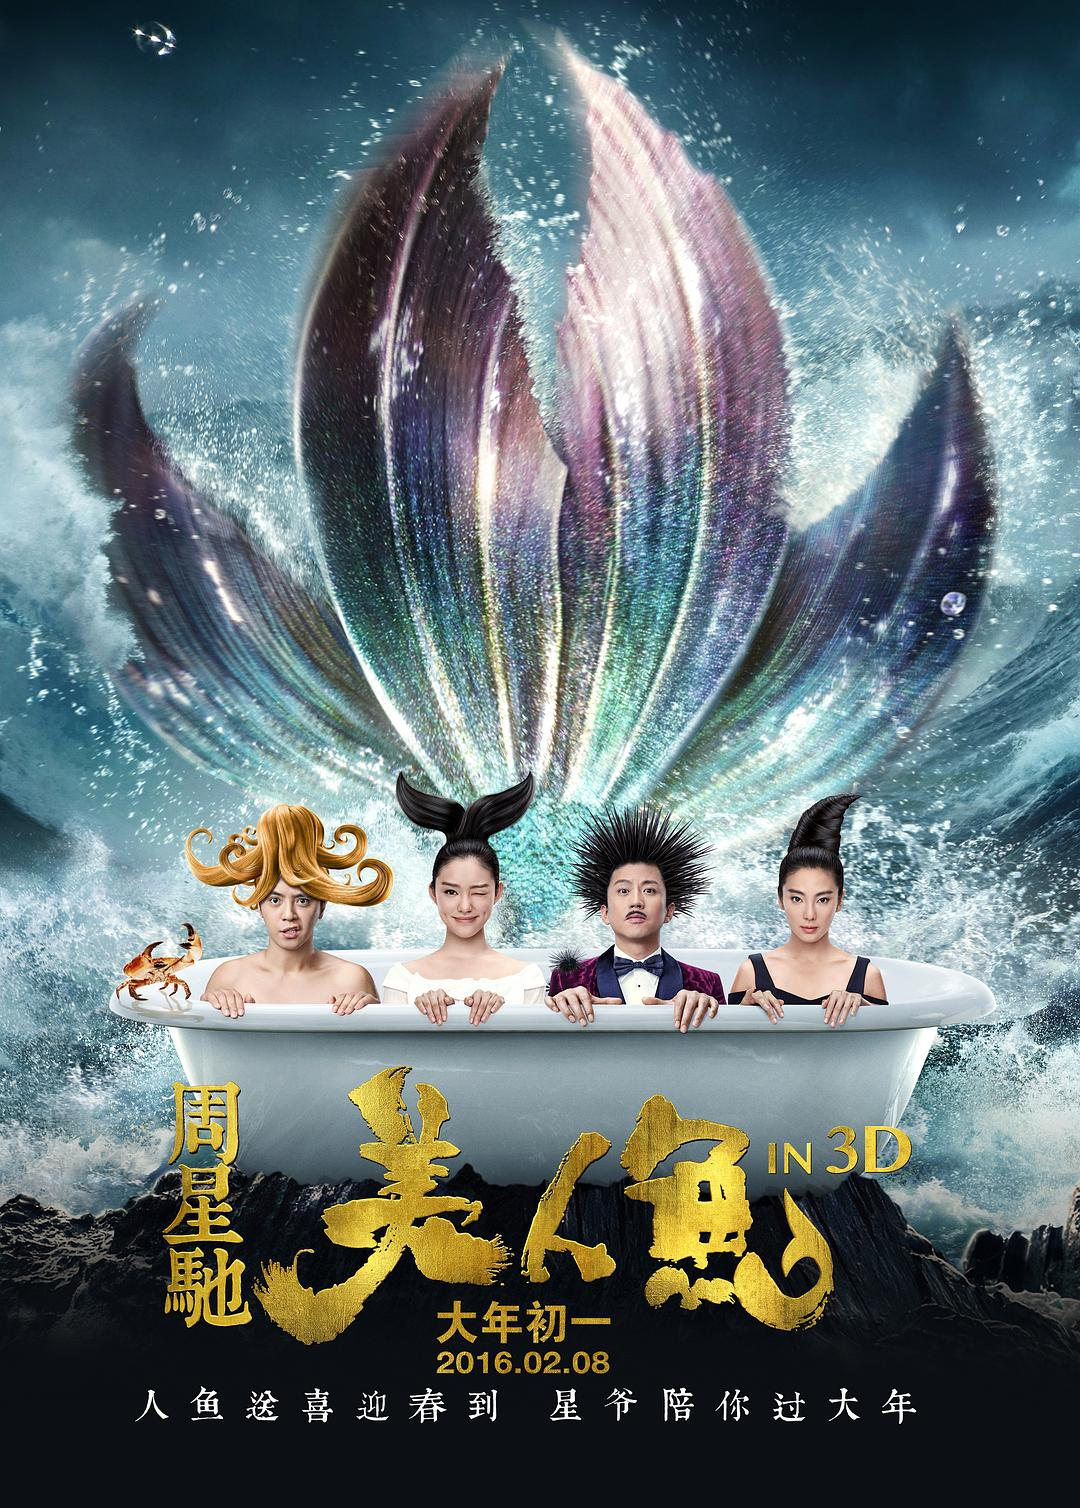 悠悠MP4_MP4电影下载_美人鱼 The.Mermaid.2016.LIMITED.1080p.BluRay.x264-USURY 7.71GB